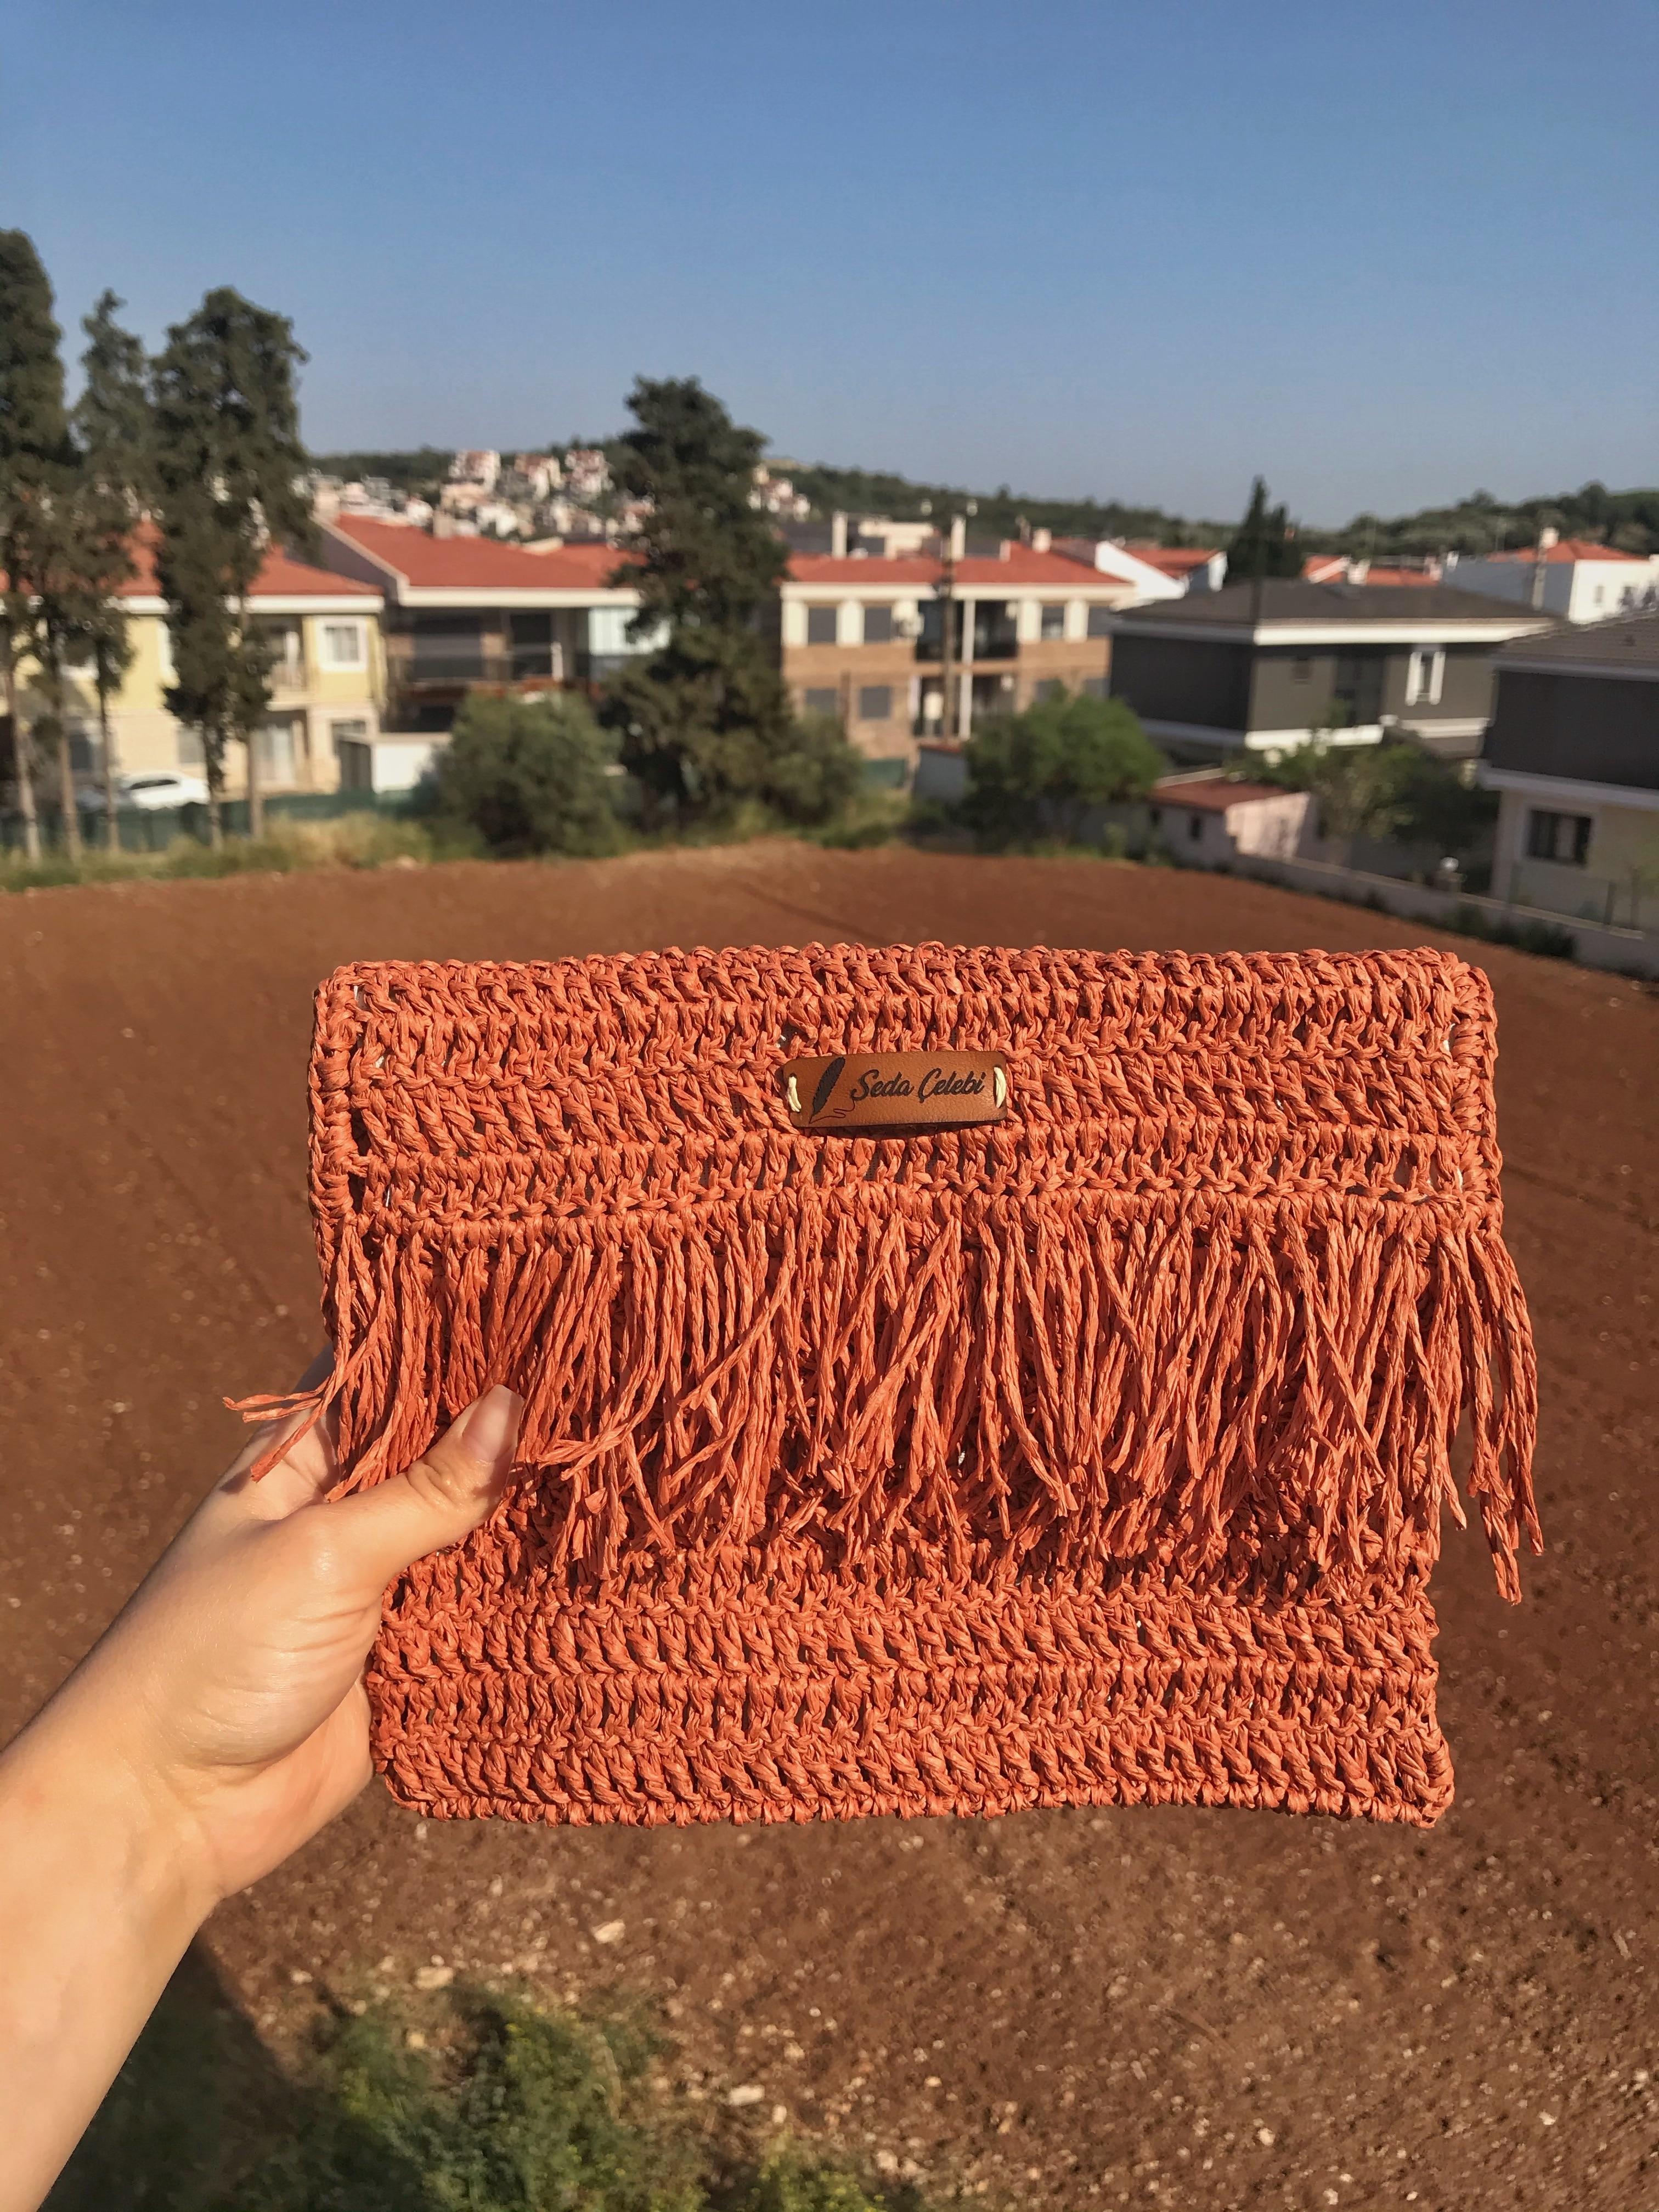 Women Woven Bag 2021 Fashion Summer Beach Cinnamon Color Handmade Trendy Best Model Cool New Collection cinnamon cider decorative fragrance 1 3lb bag